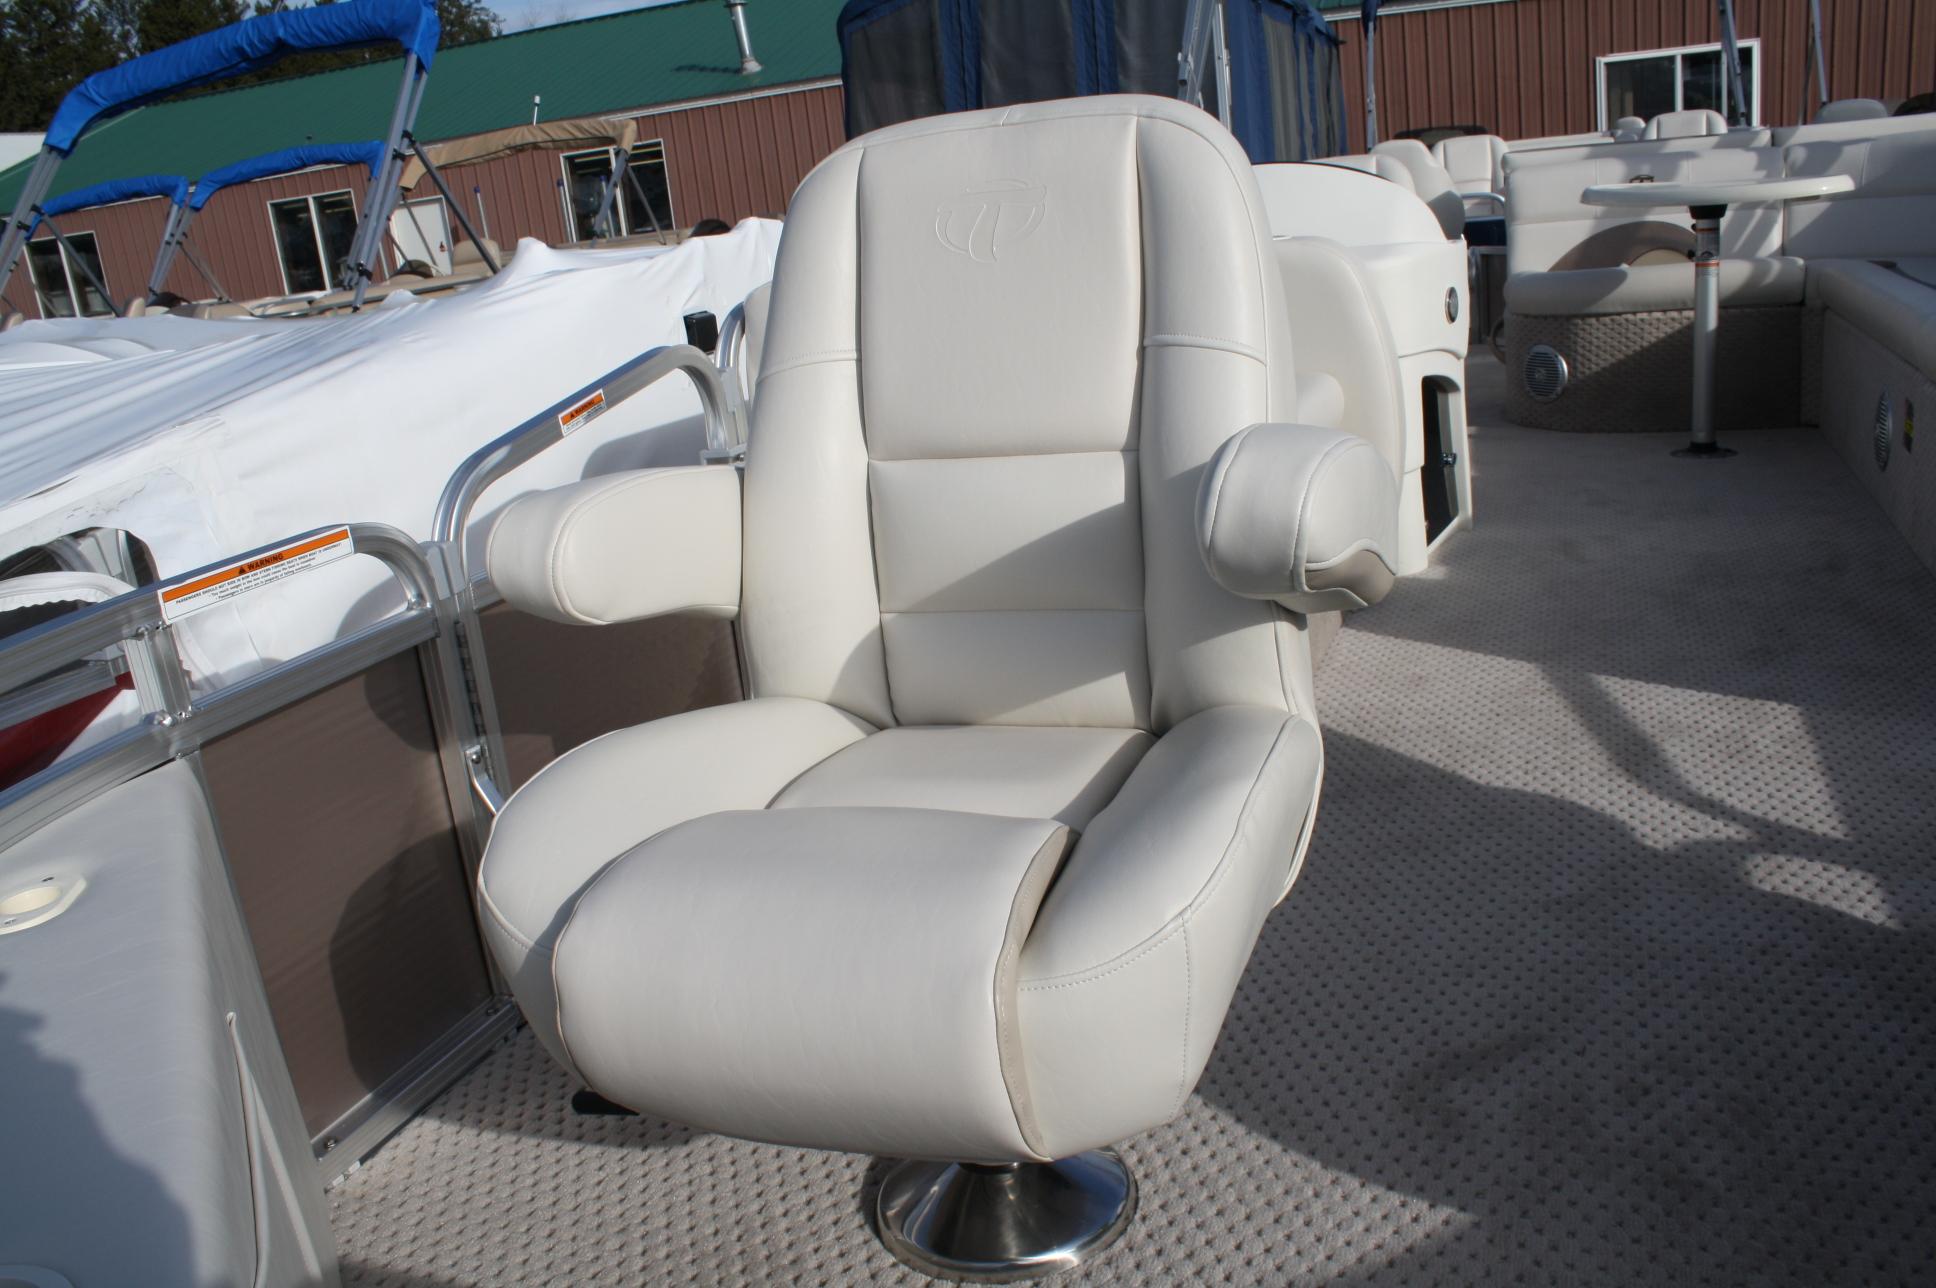 Boat rental in rio de janeiro pontoon boat seats for sale for Pontoon boat interior designs